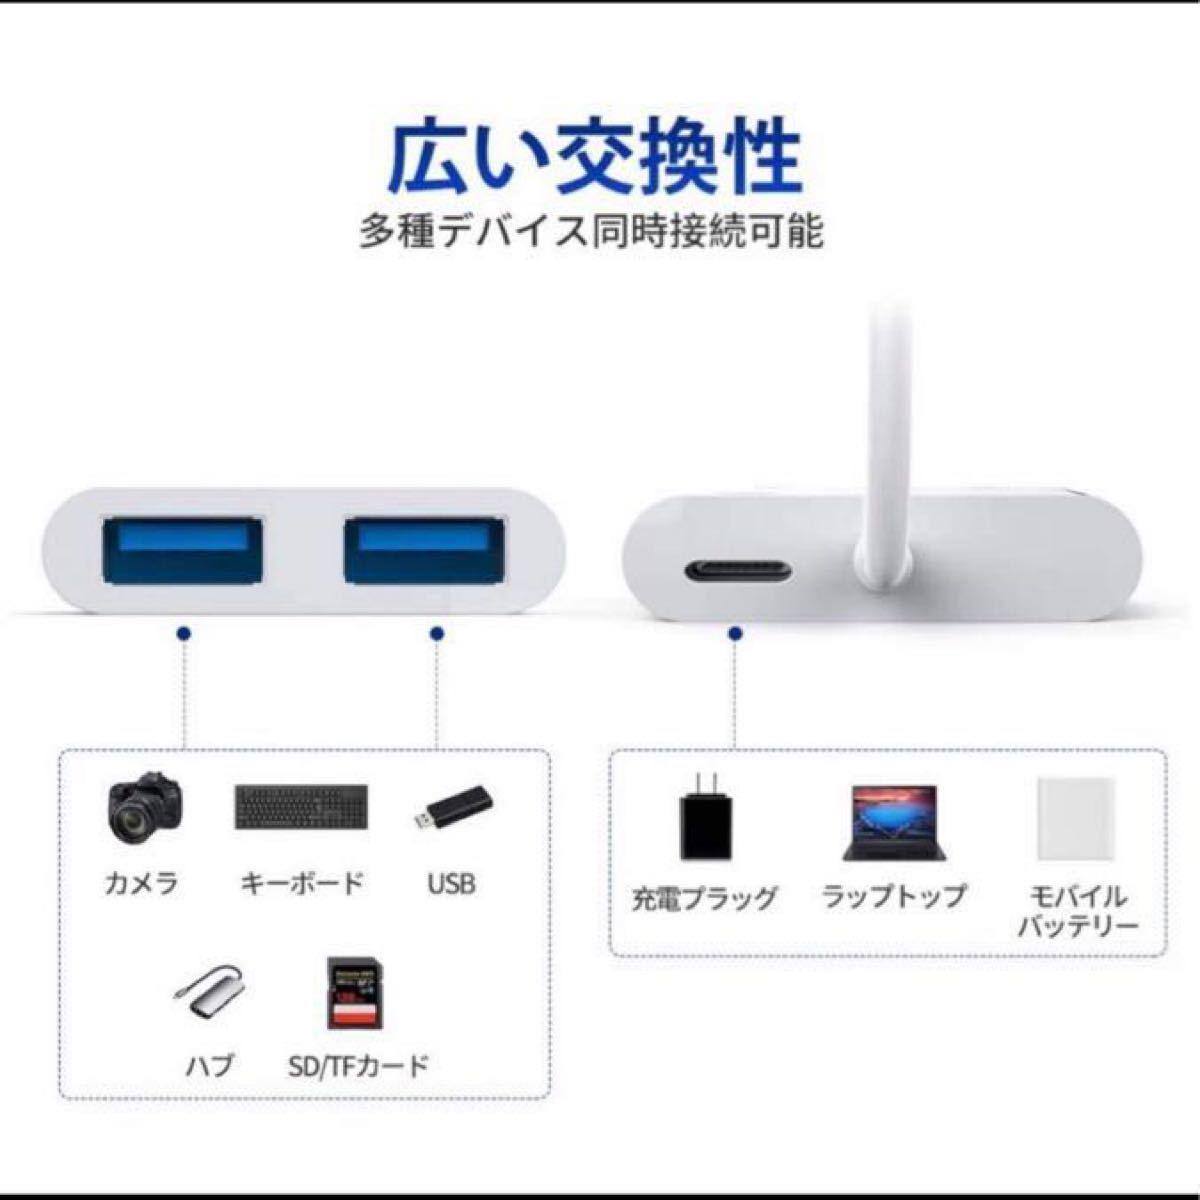 USB カメラ アダプタ iPhone/iPad専用 3in1ライトニング USBカメラ 変換アダプター